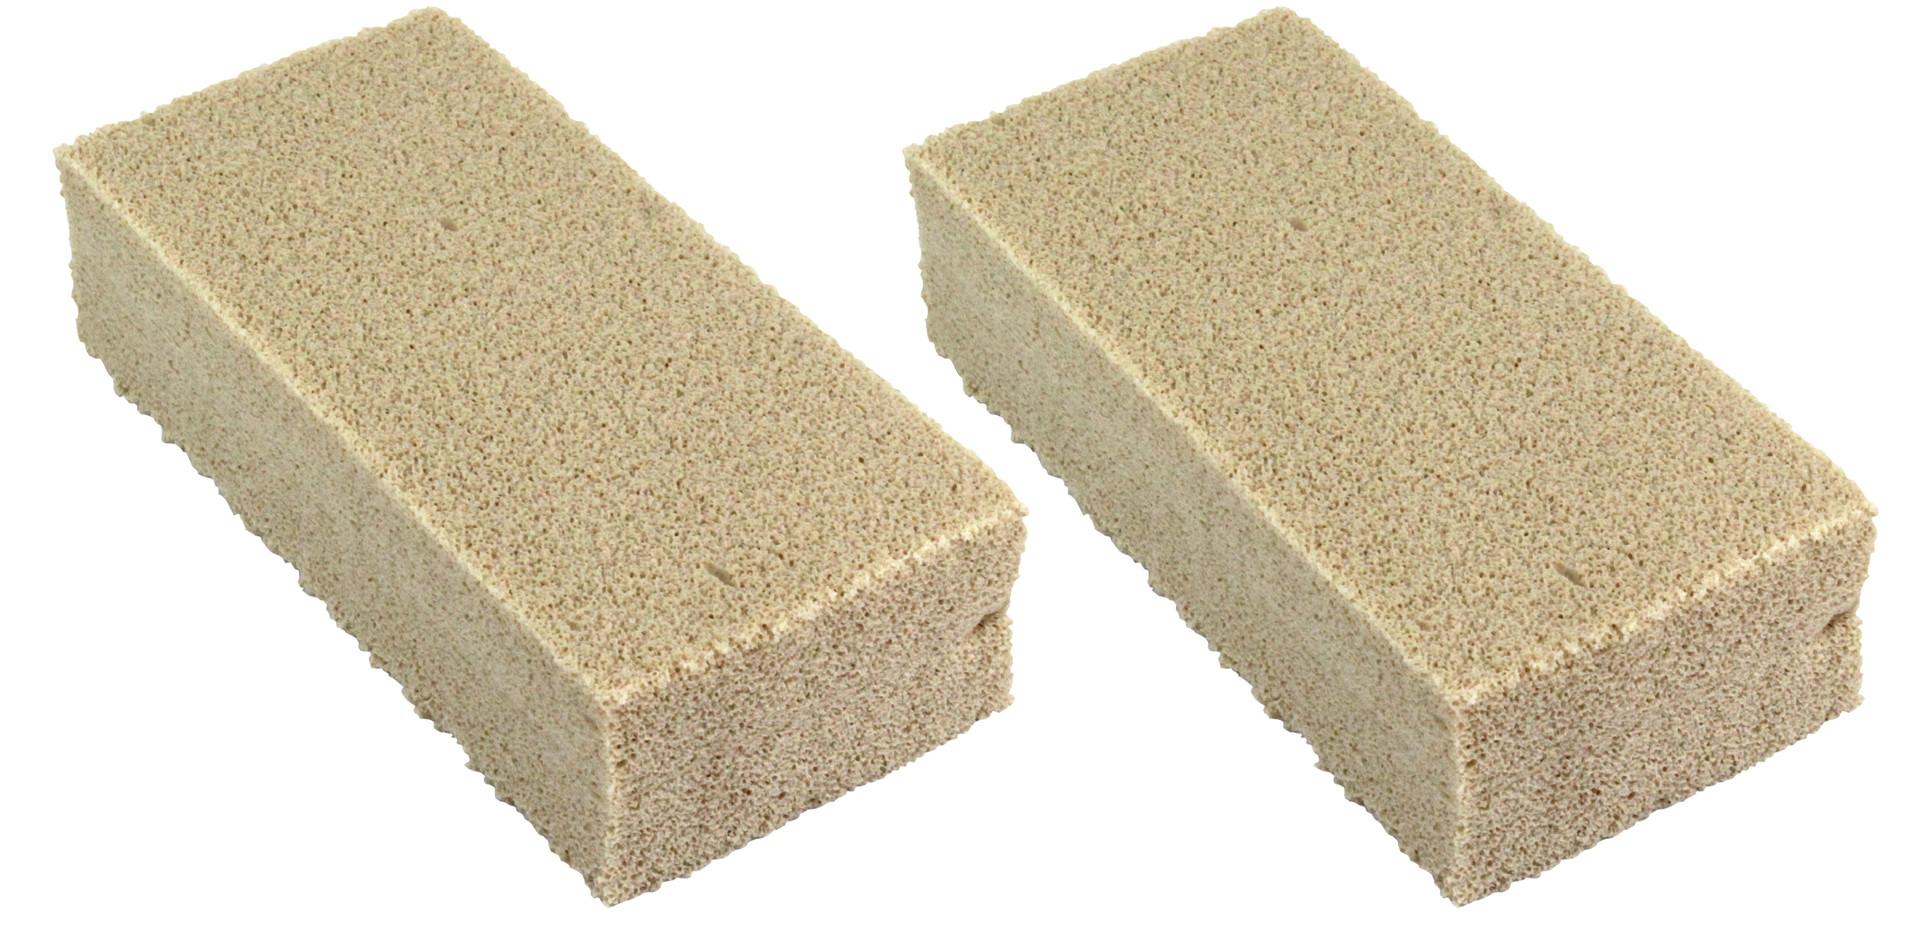 dry cleaning sponges 2pk.jpg